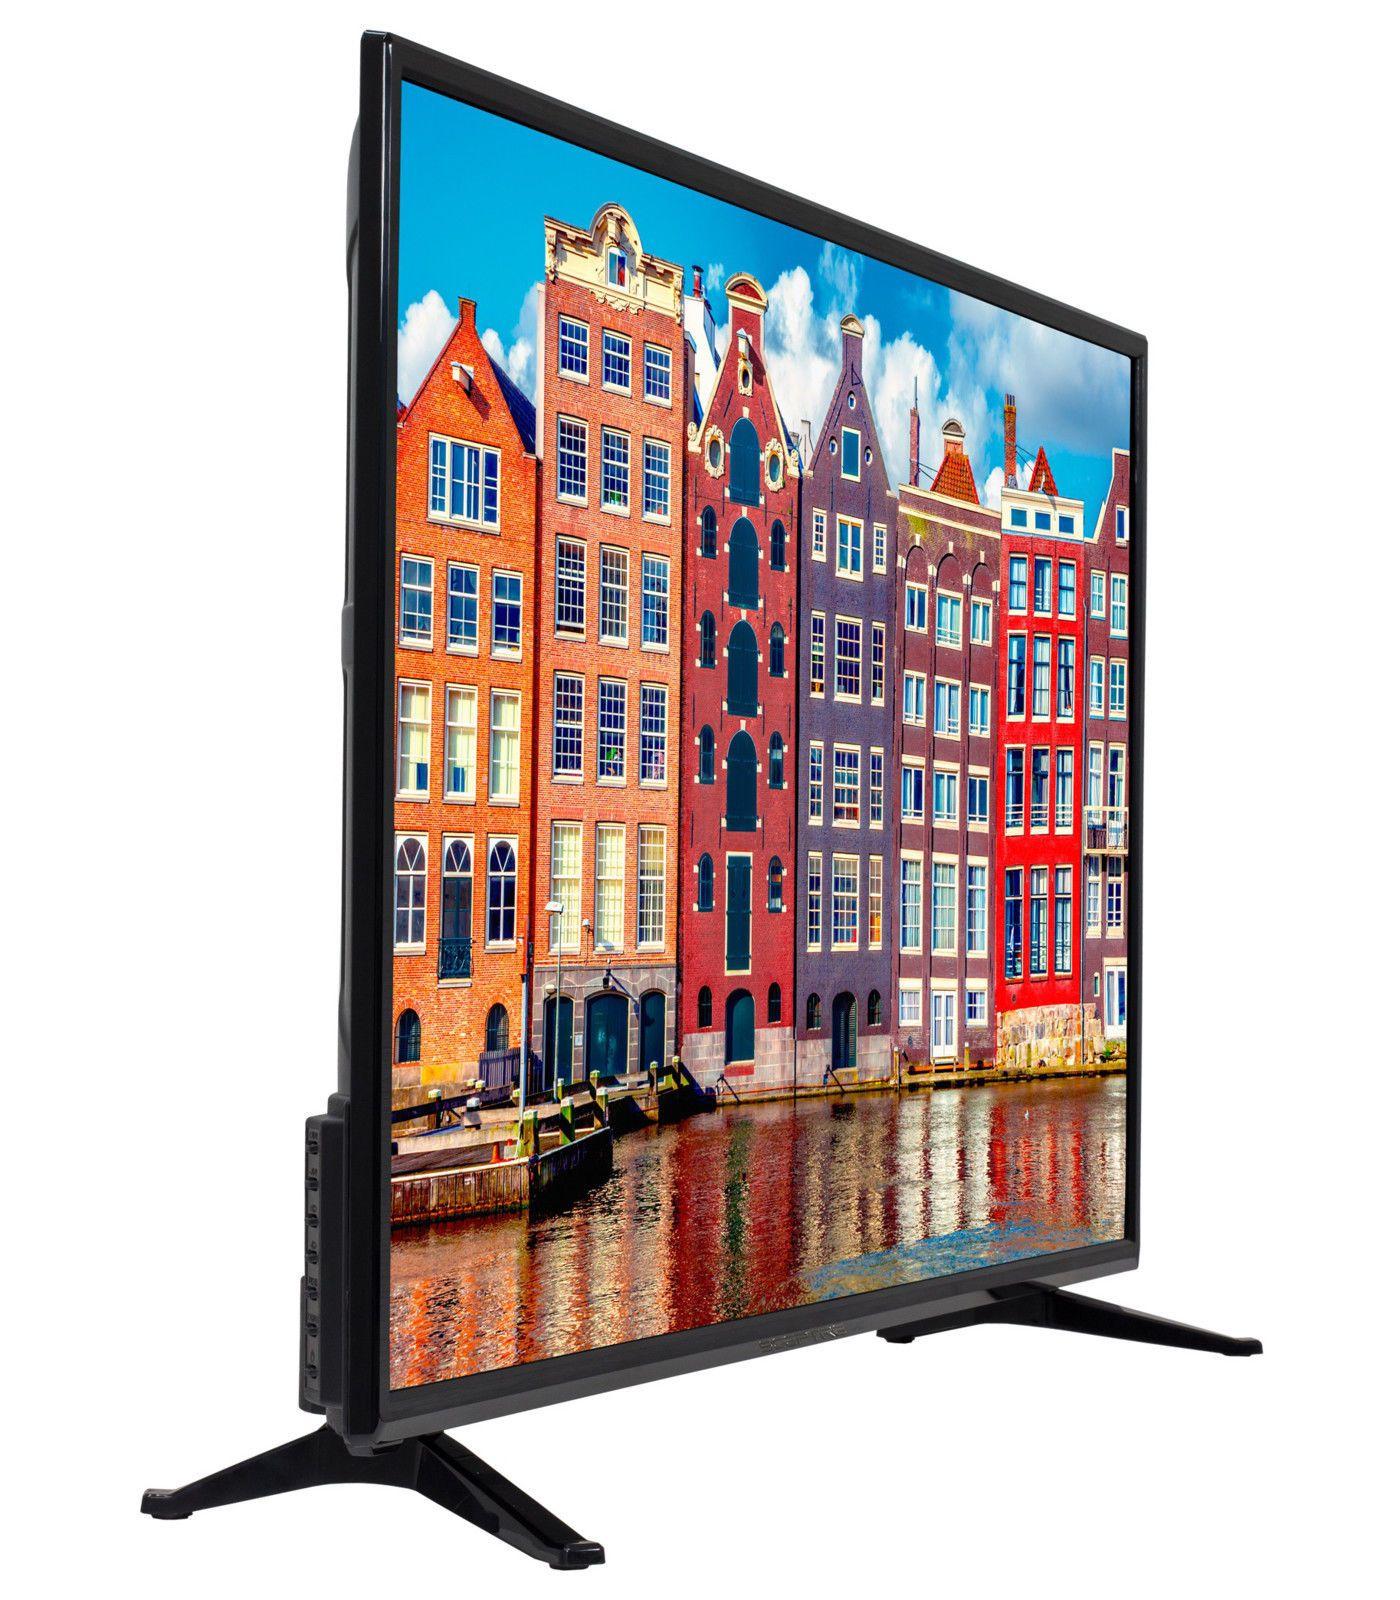 Sceptre 50 Class Fhd 1080p Led Tv X505bv Fsr Led Tv Lcd Television Led